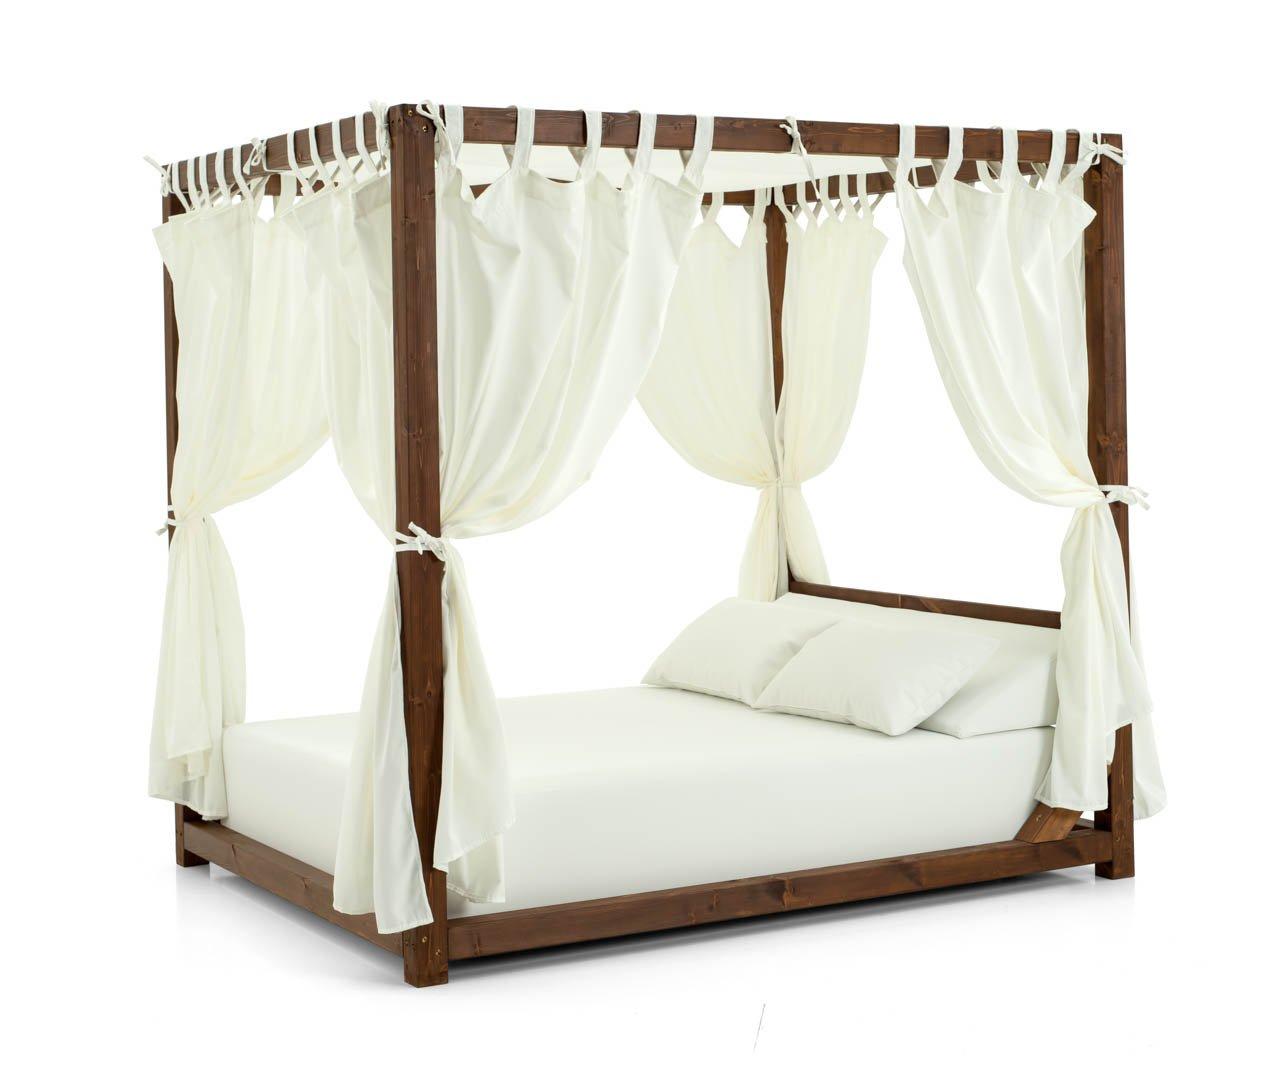 Estructura de madera para tumbona doble de exterior: Amazon.es: Jardín